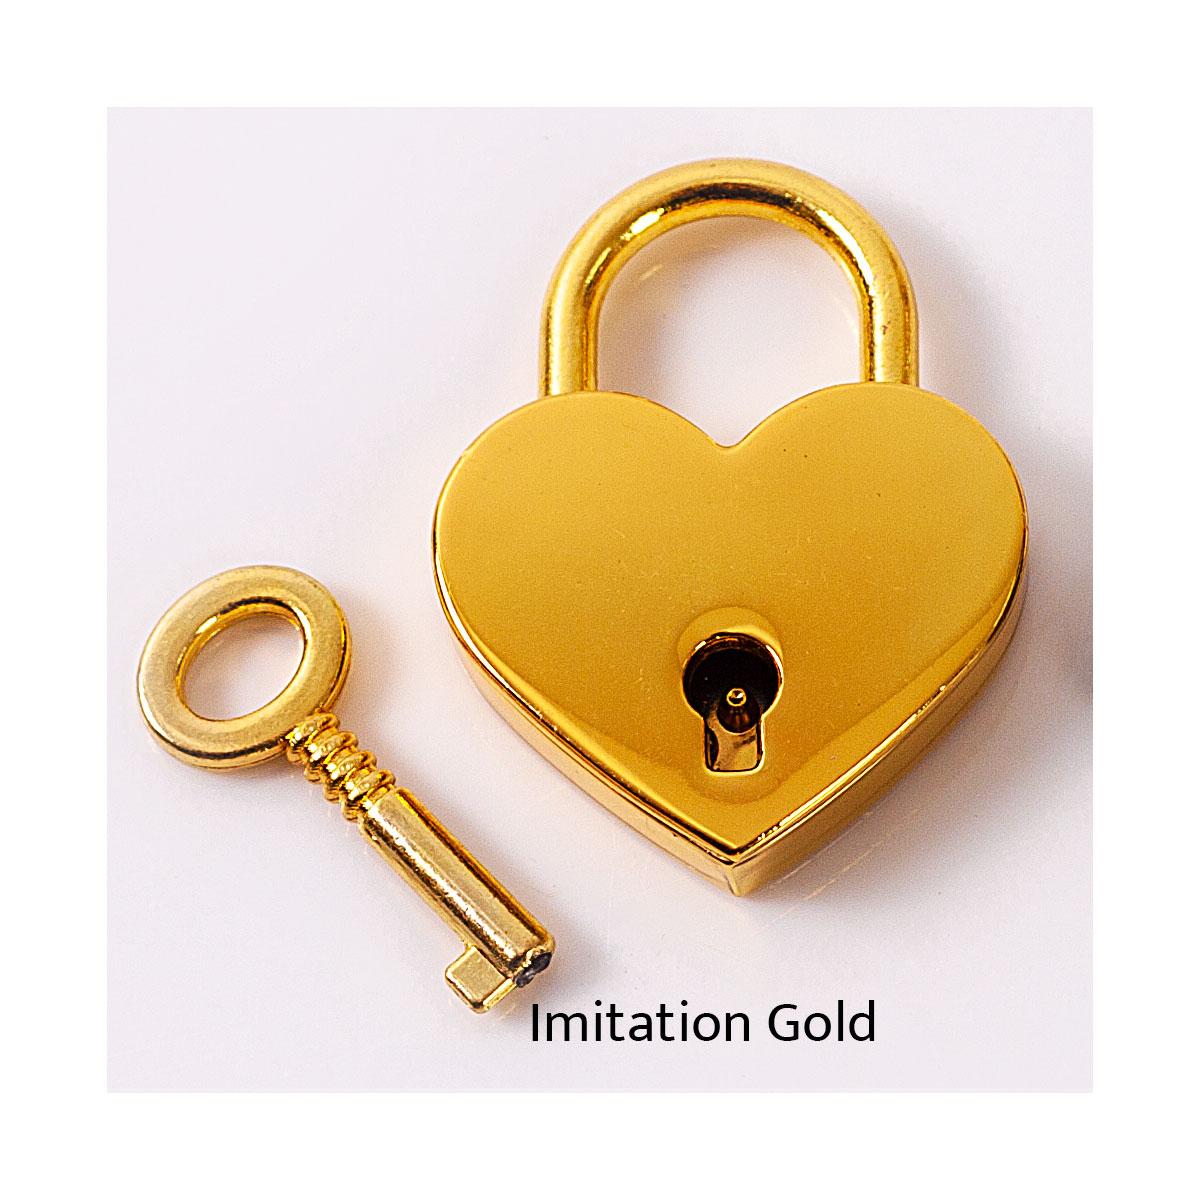 Imitation Gold Lock